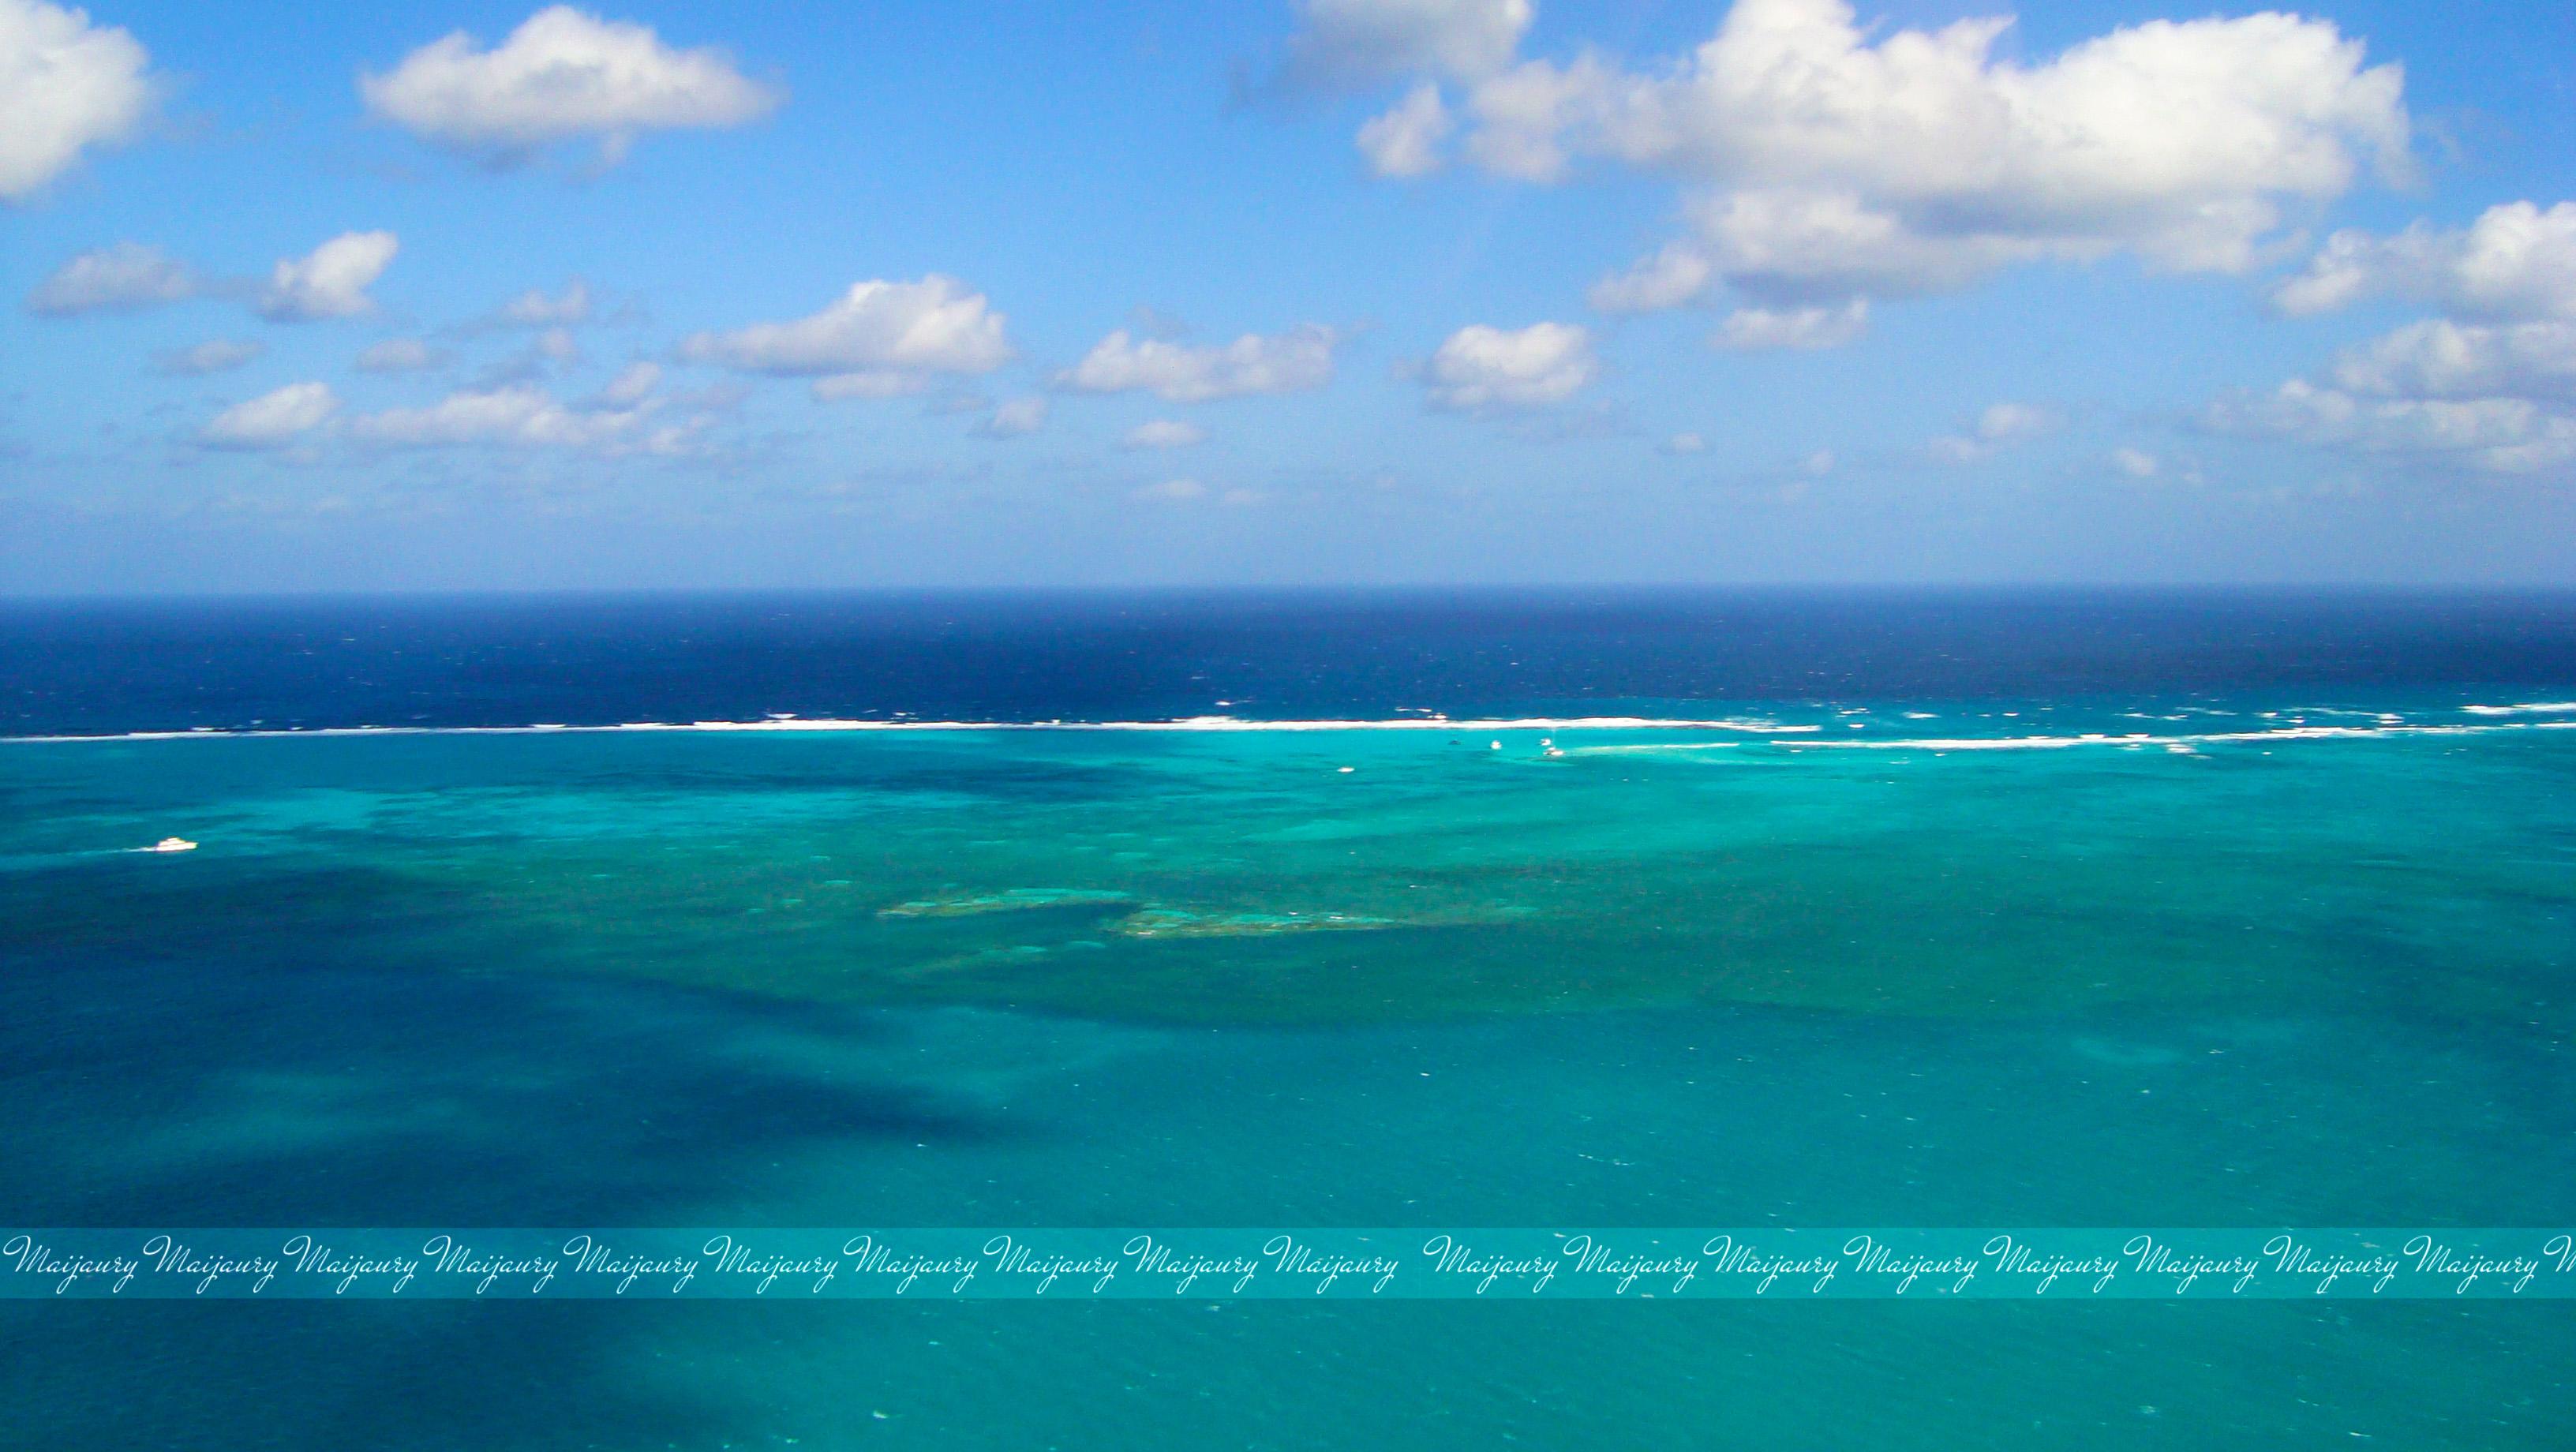 Underwater View Of School Of Fish Swarming In Shallow Ocean Water ...